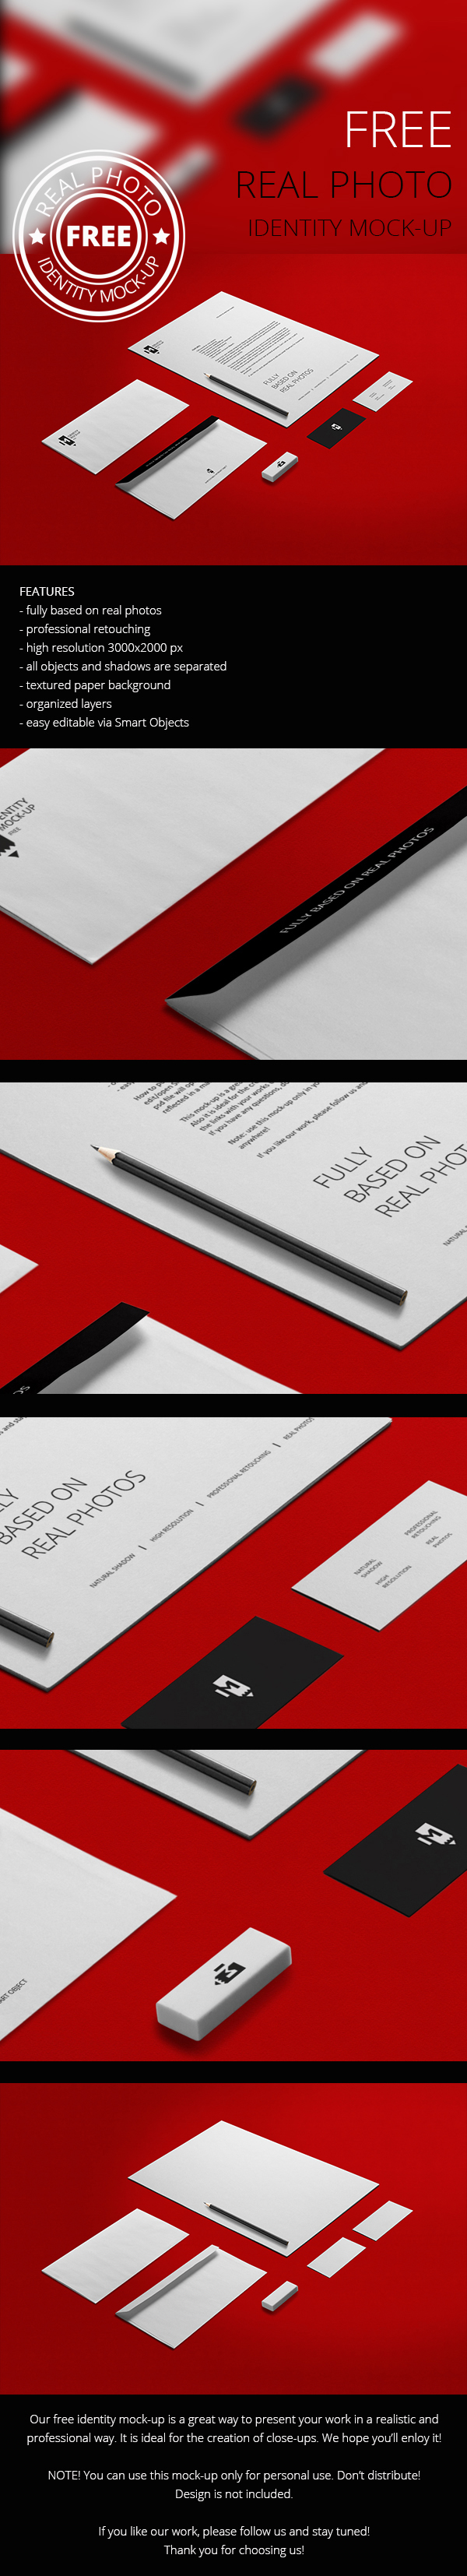 identity Stationery brand mock-up Mockup mocks free clevery identity mock-up free identity mockup free letterhead envelope business card logo Logotype